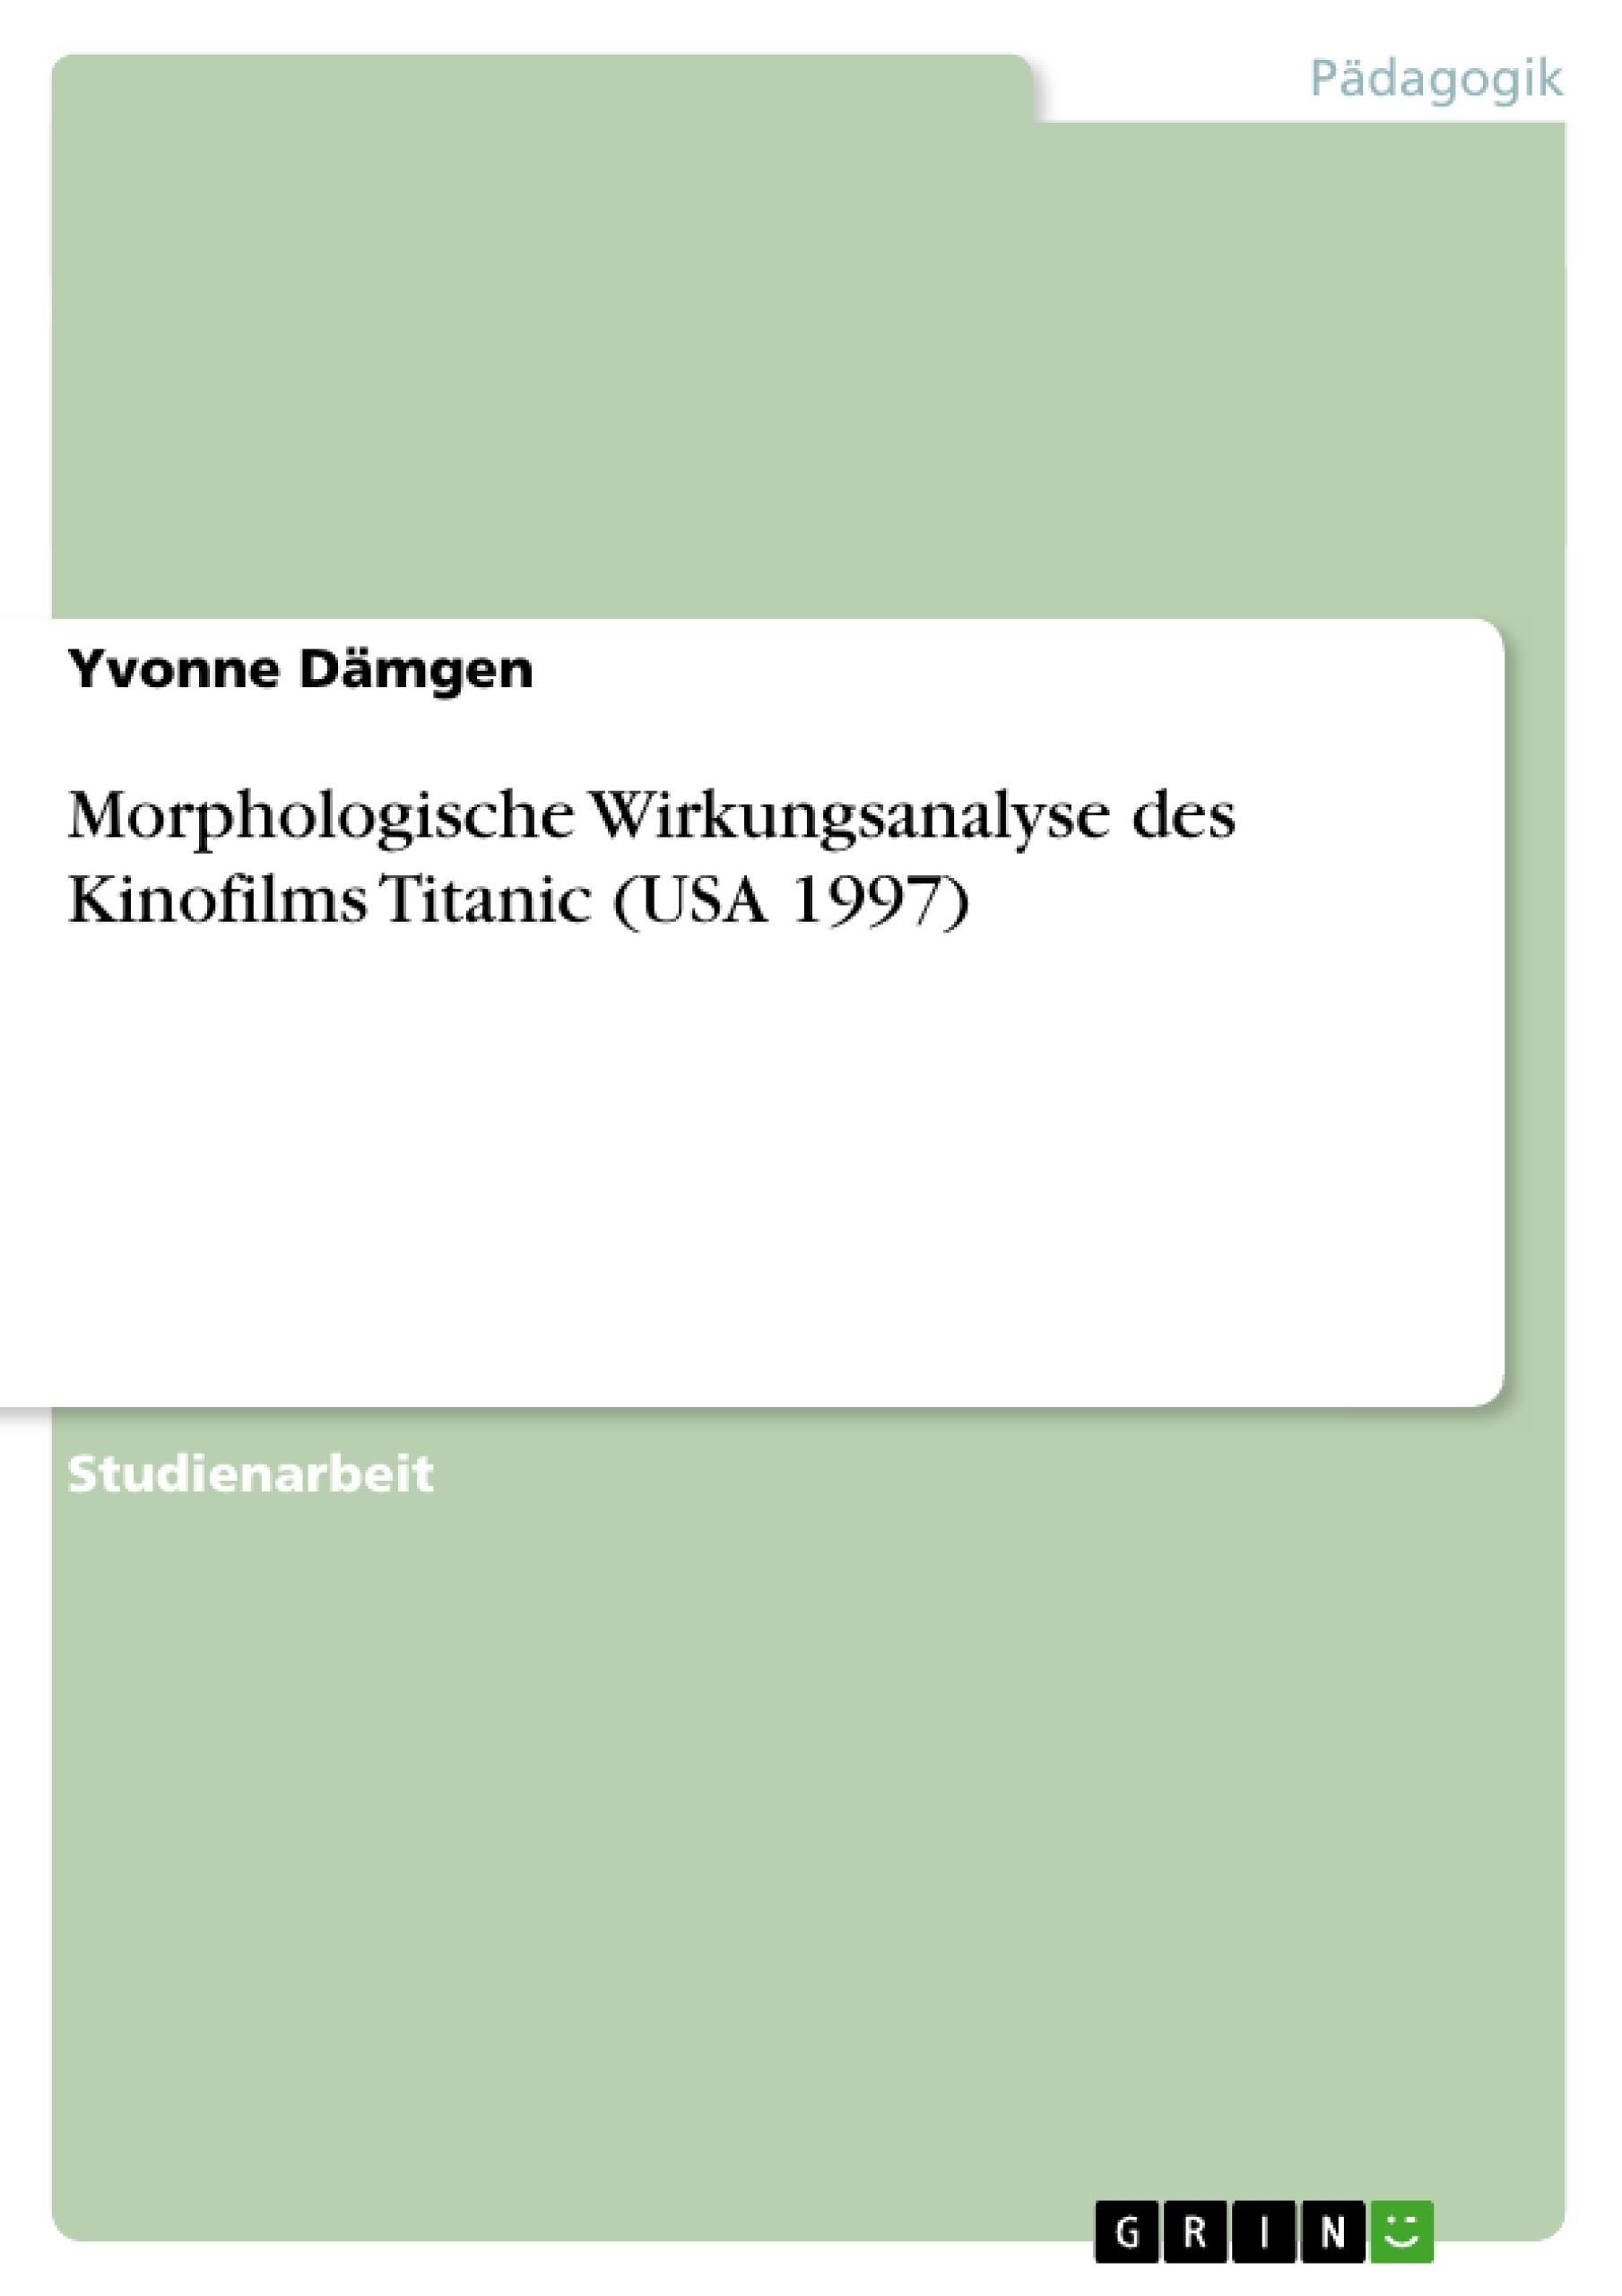 Titel: Morphologische Wirkungsanalyse des Kinofilms Titanic (USA 1997)